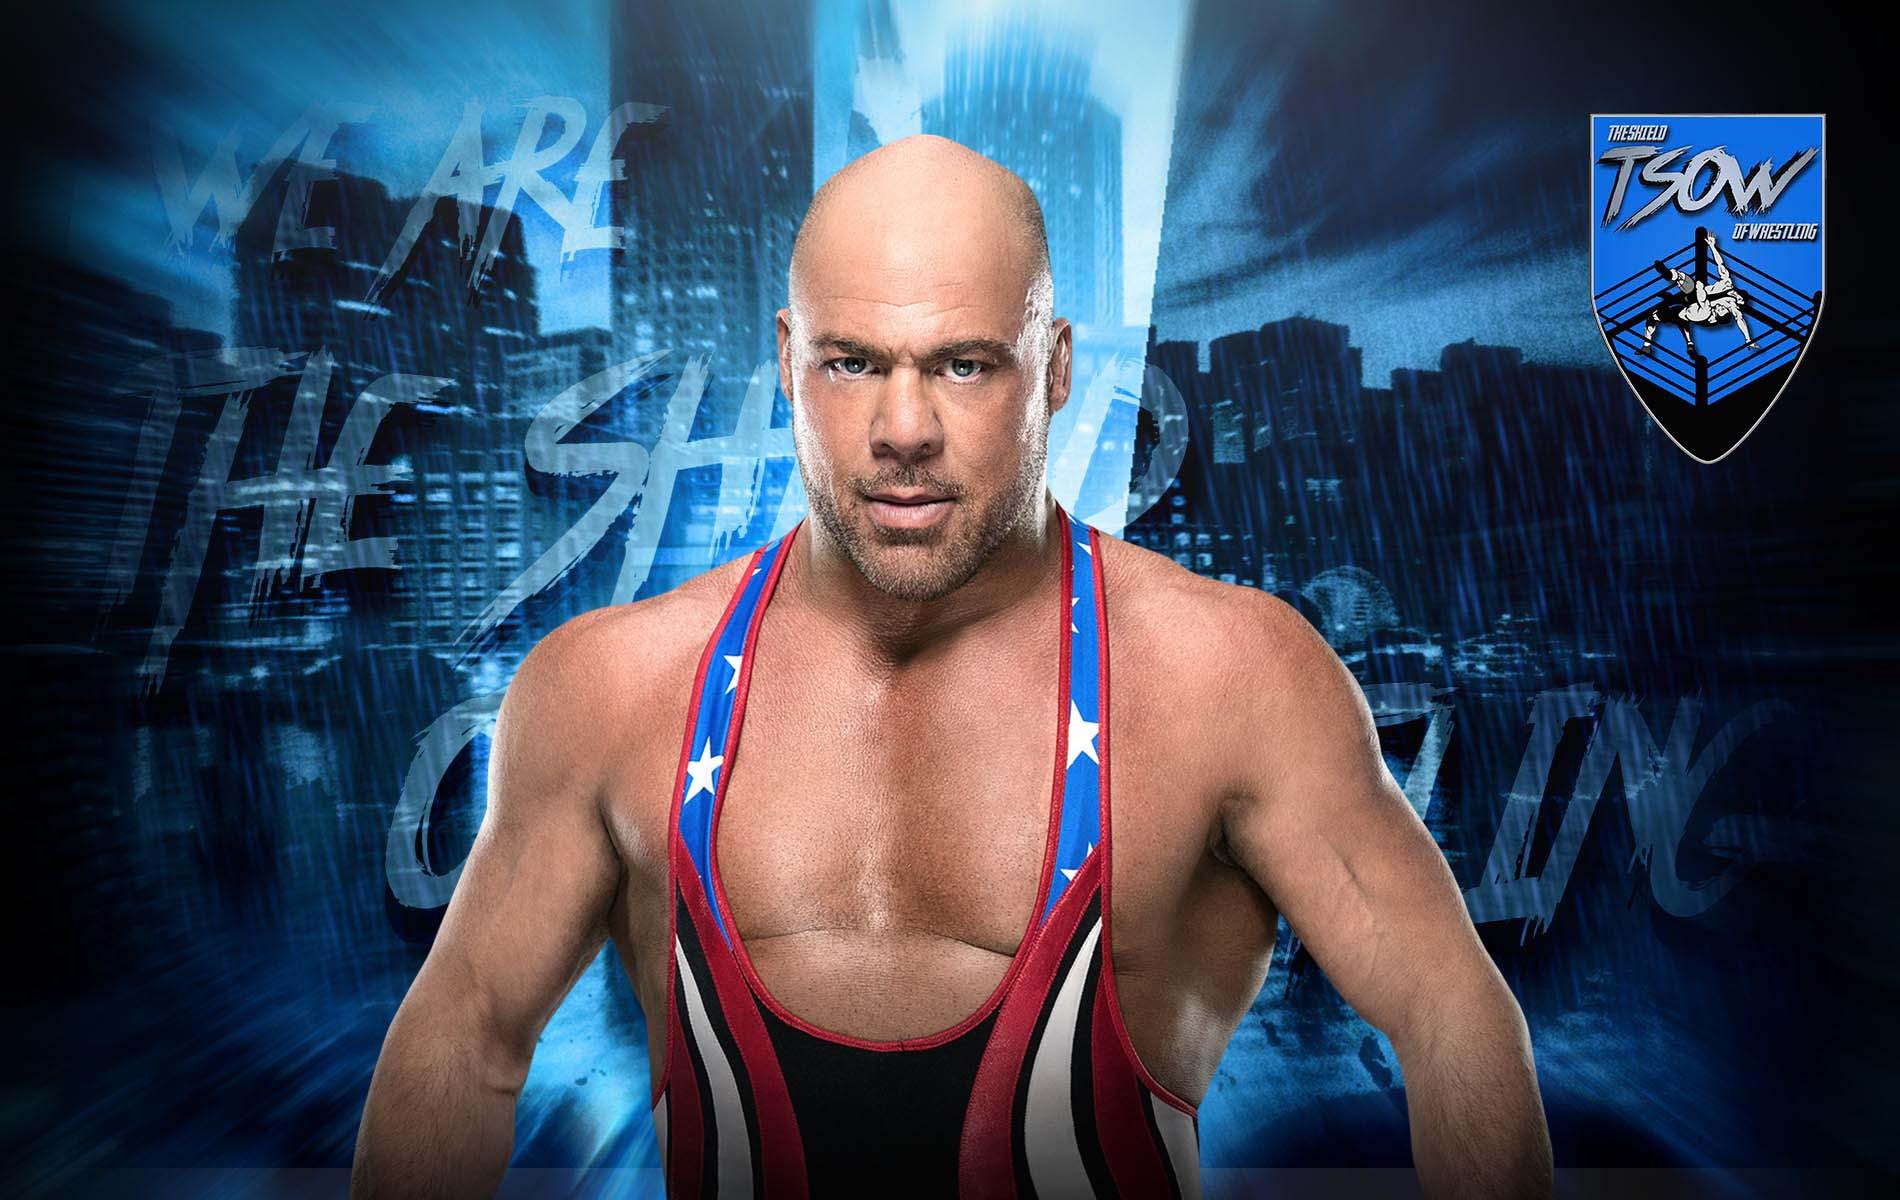 Kurt Angle tornerà a lottare per affrontare John Cena?